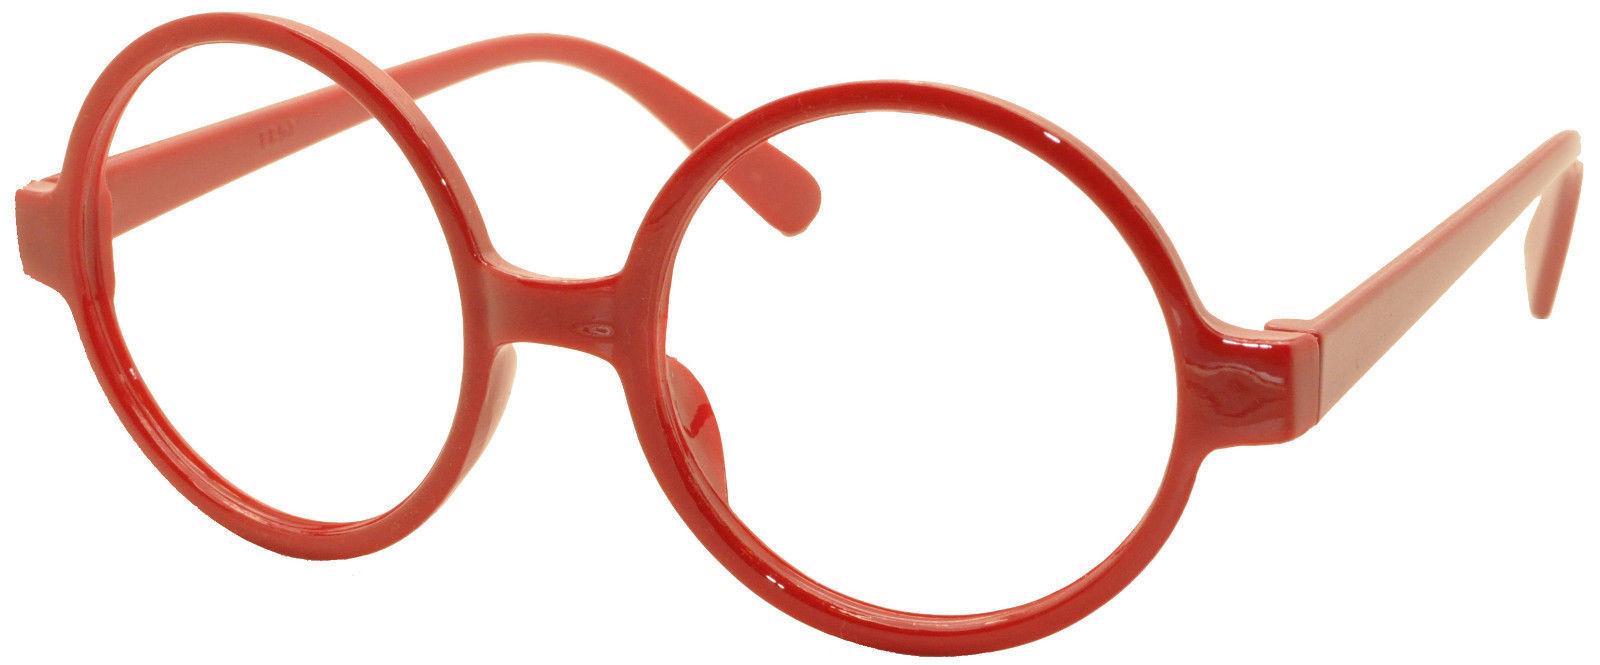 4 x Vintage Classic Geek Nerd Style Glasses Frame NO LENS Cute Costume Eyewear